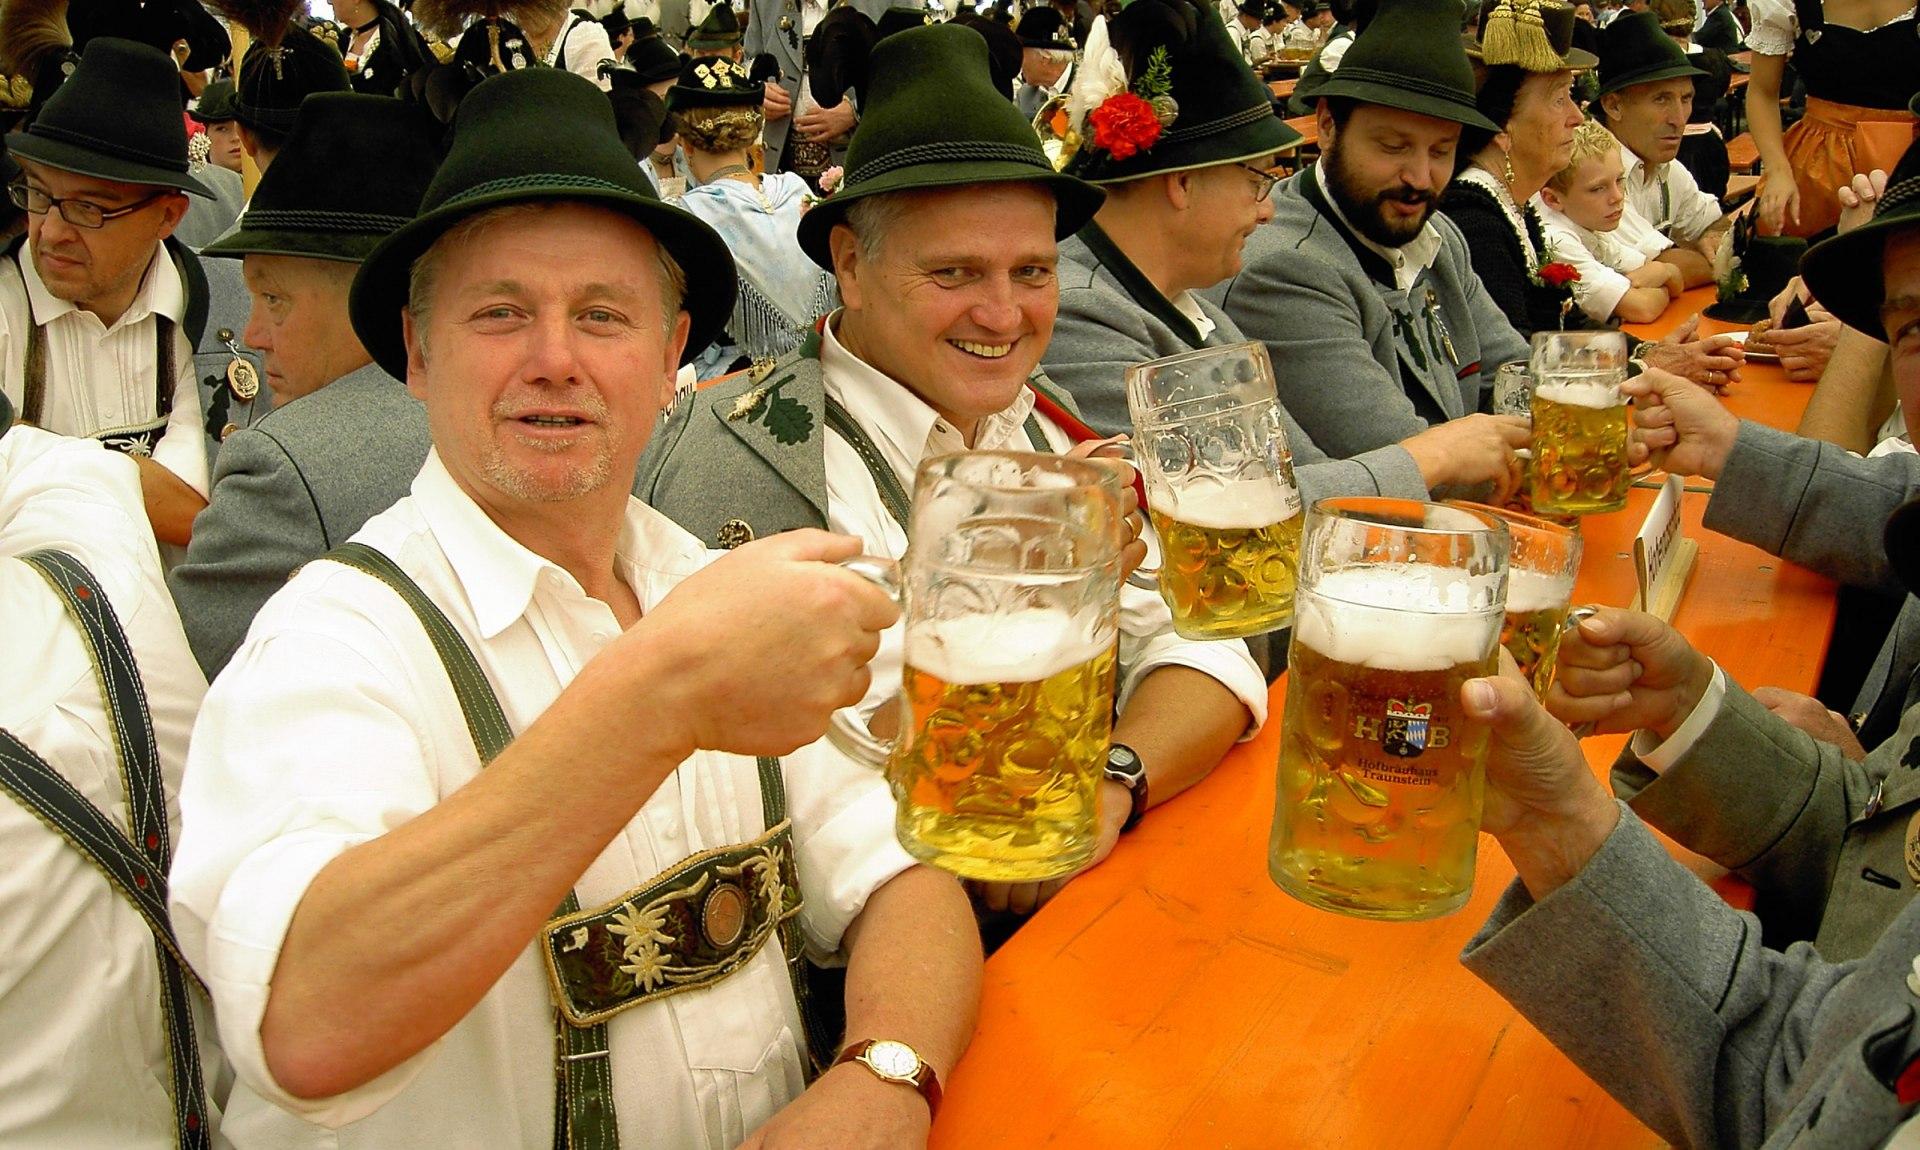 Trachtler im Bierzelt, © Tourist Info Aschau i.Ch.